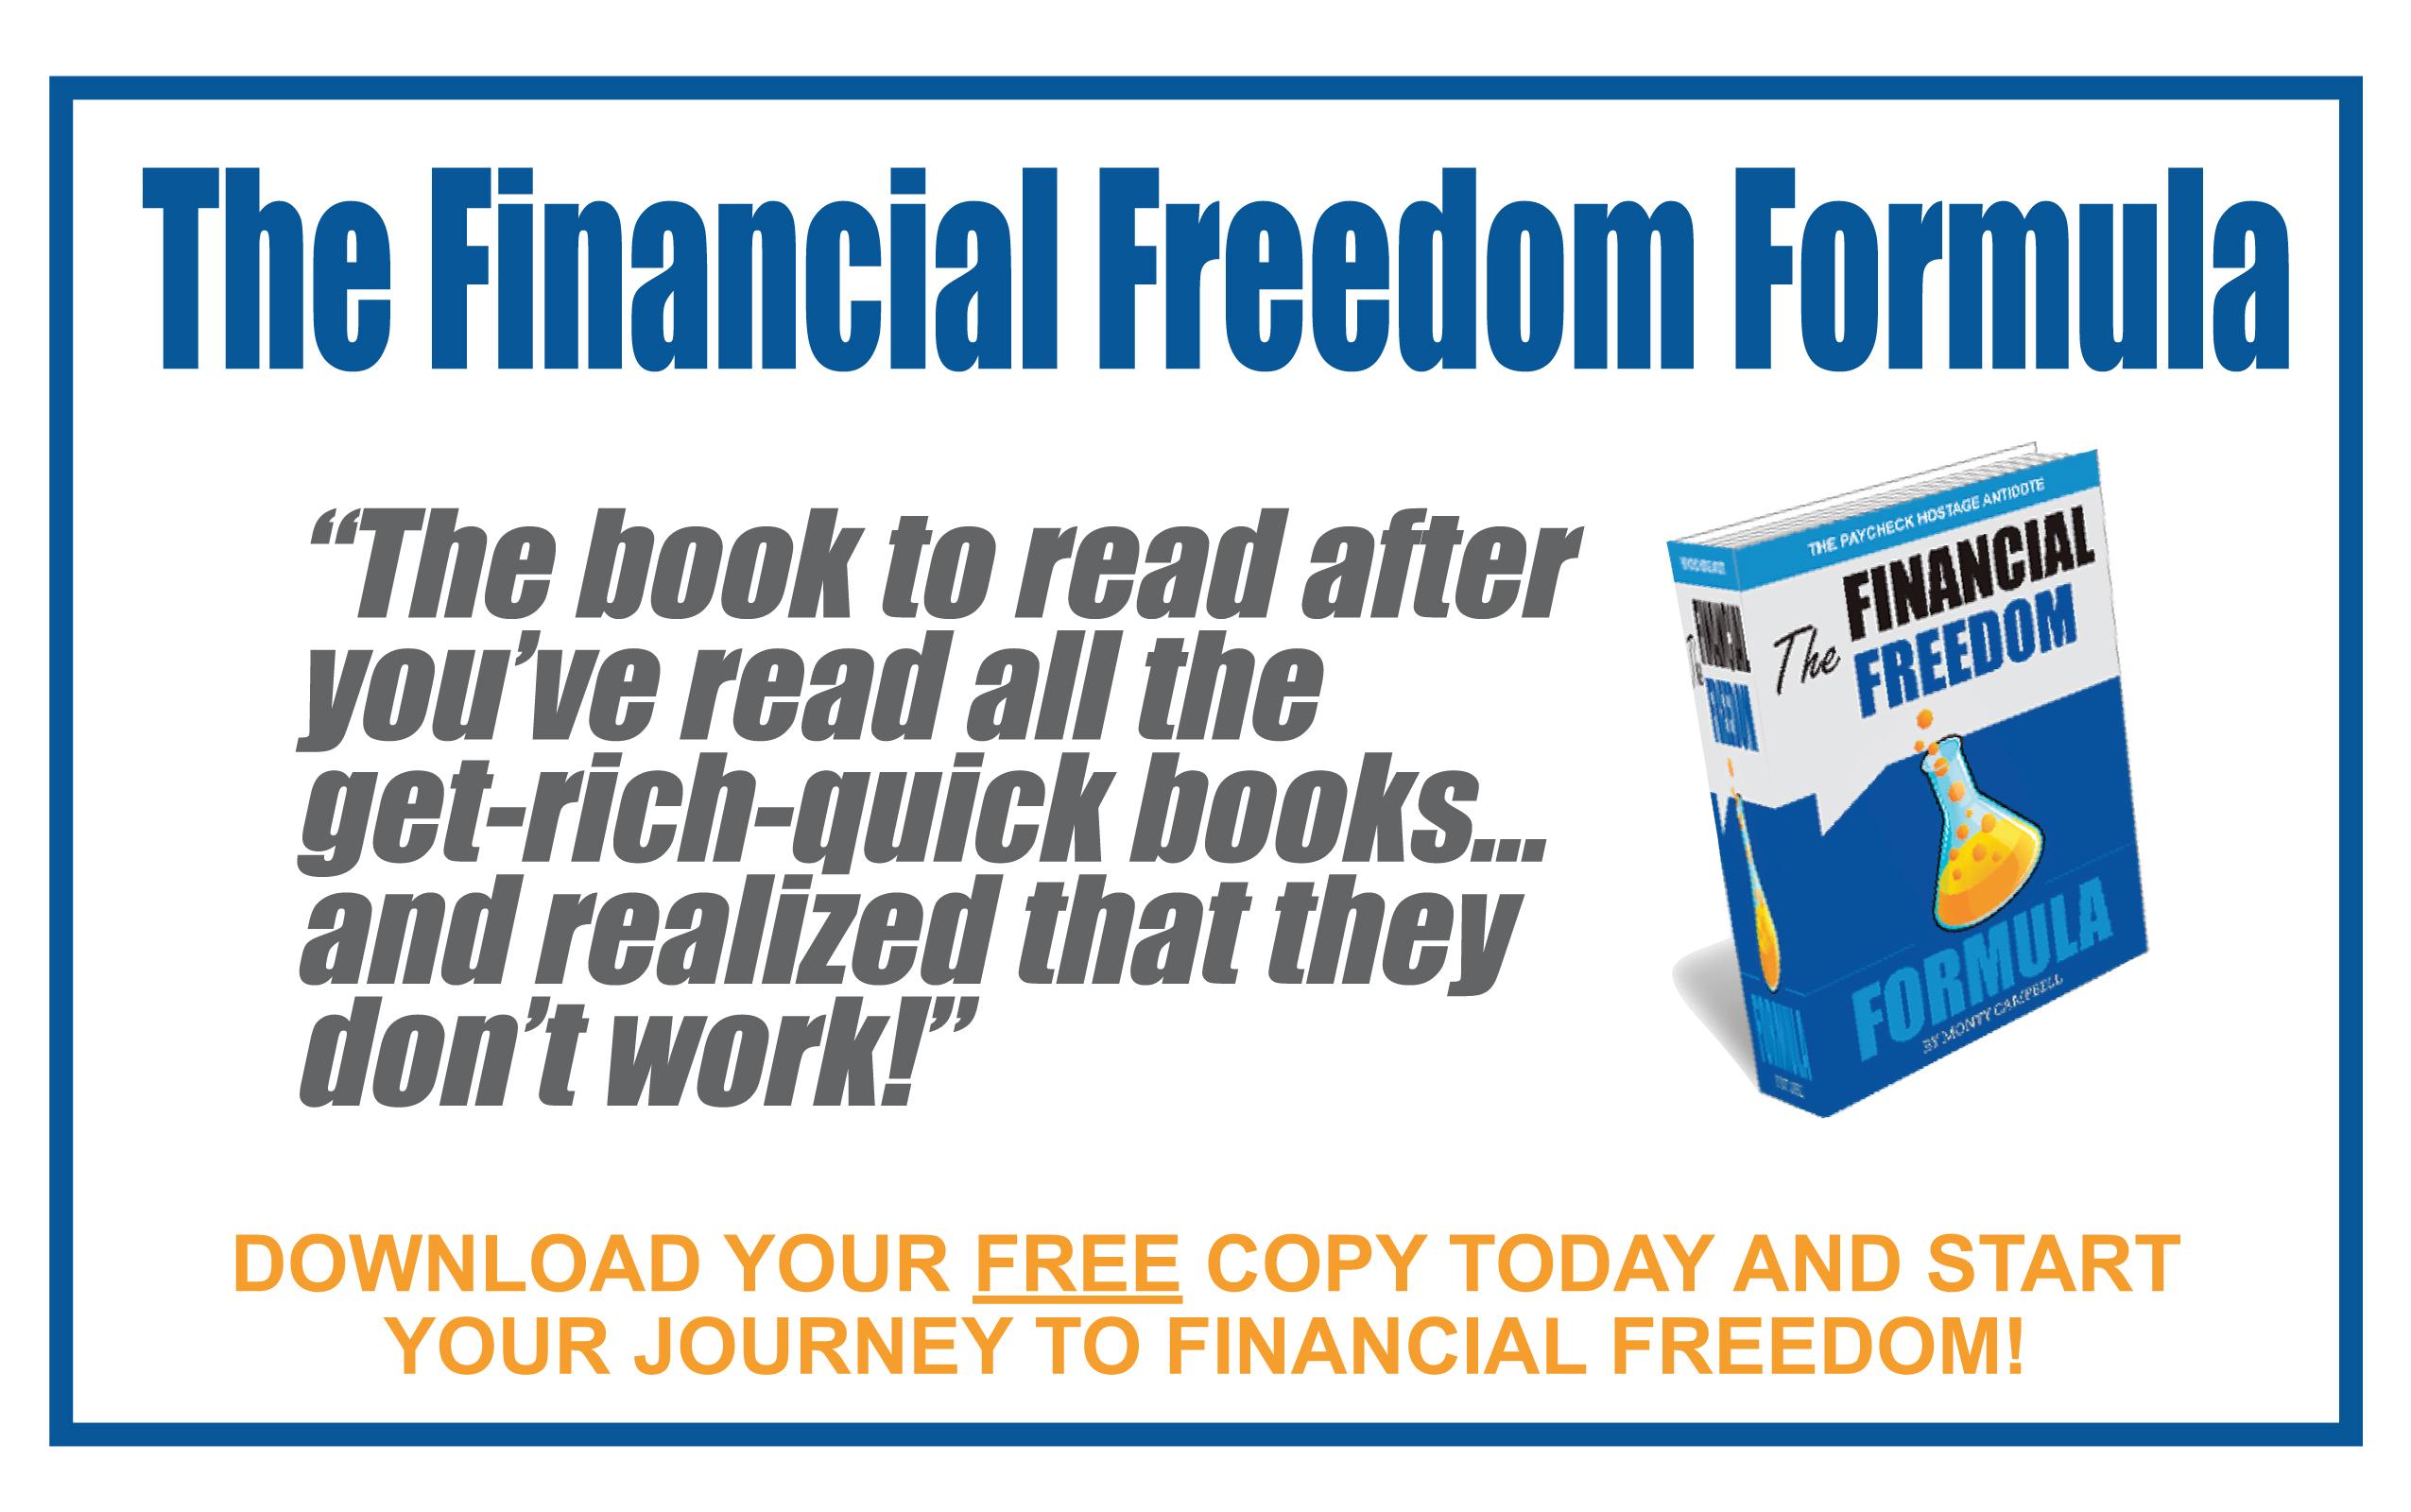 BannerGraphics-7-18-15-FinancialFreedom-MontyCampbell